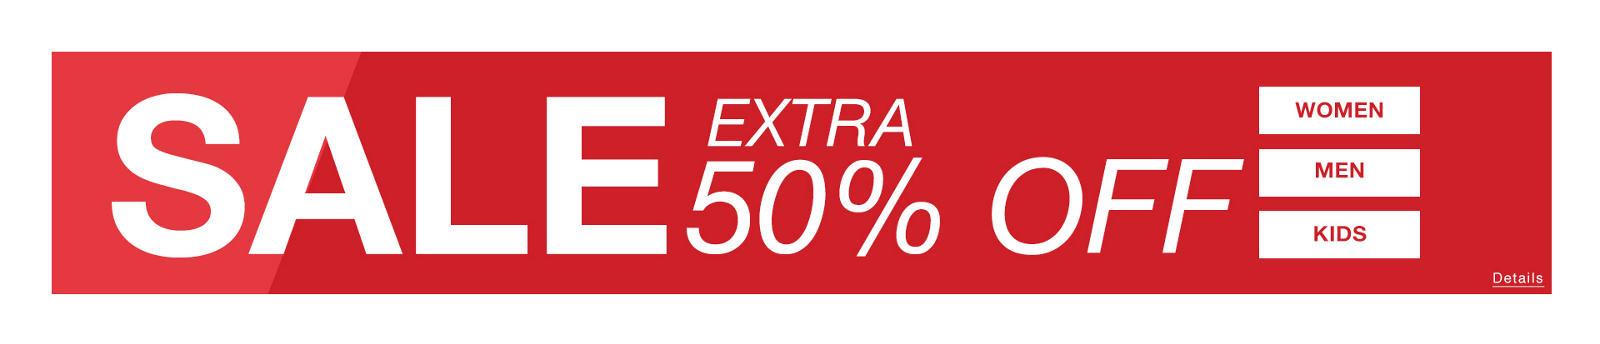 50% - 60% Off